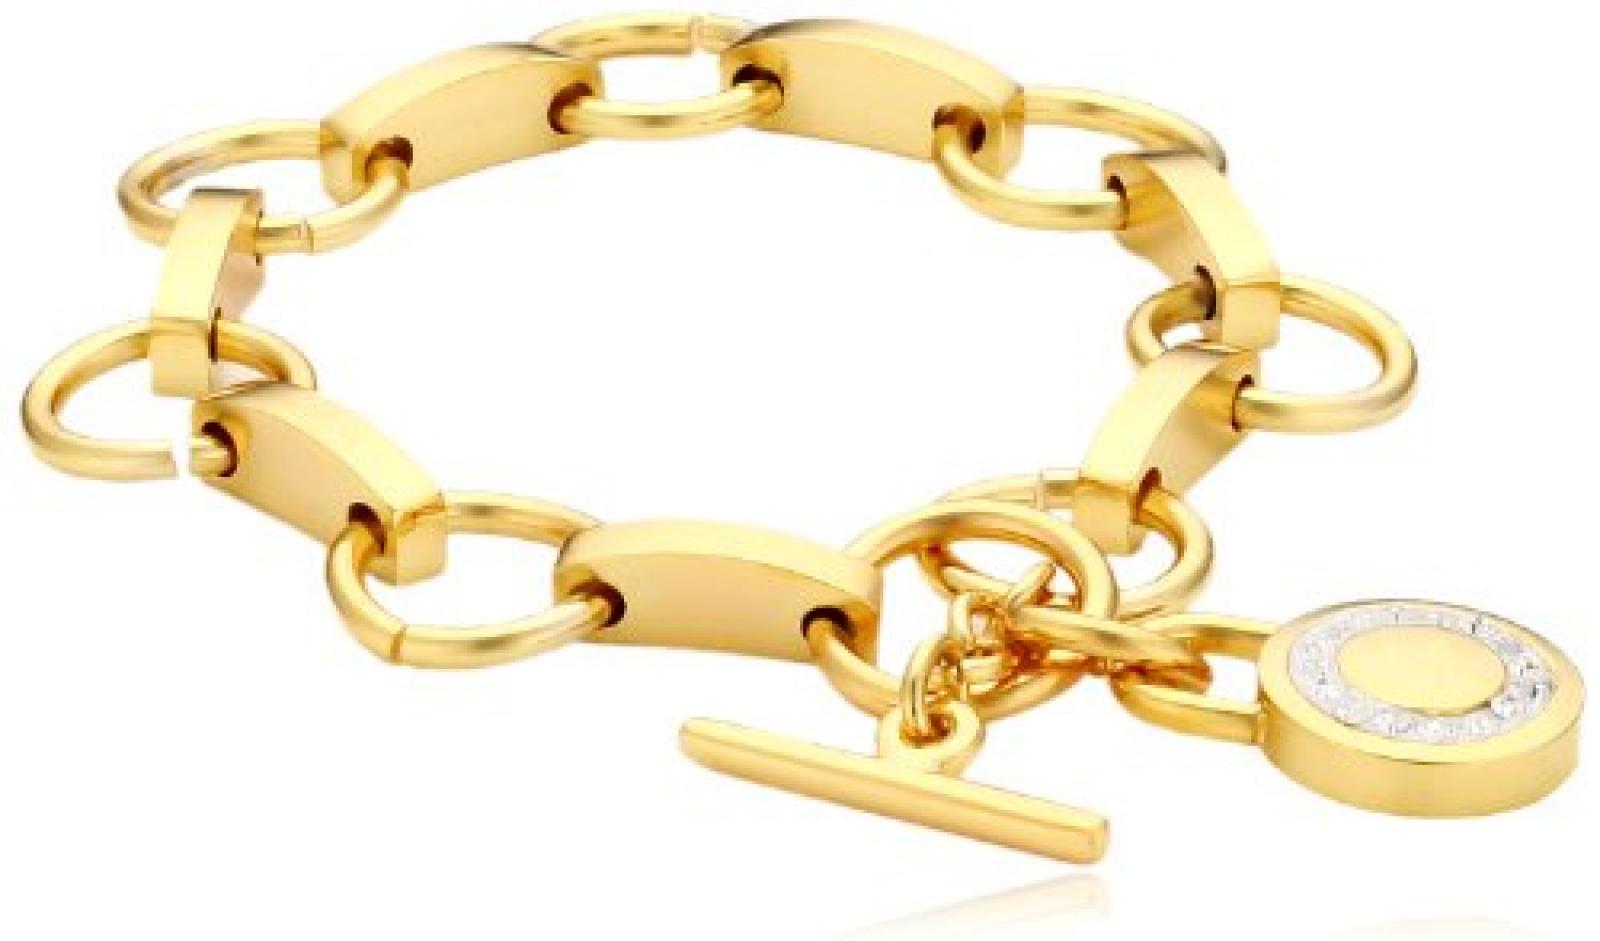 Mike Ellis New York Damen Armband Edelstahl Zirkonia 19.0 cm gold S191 IPG